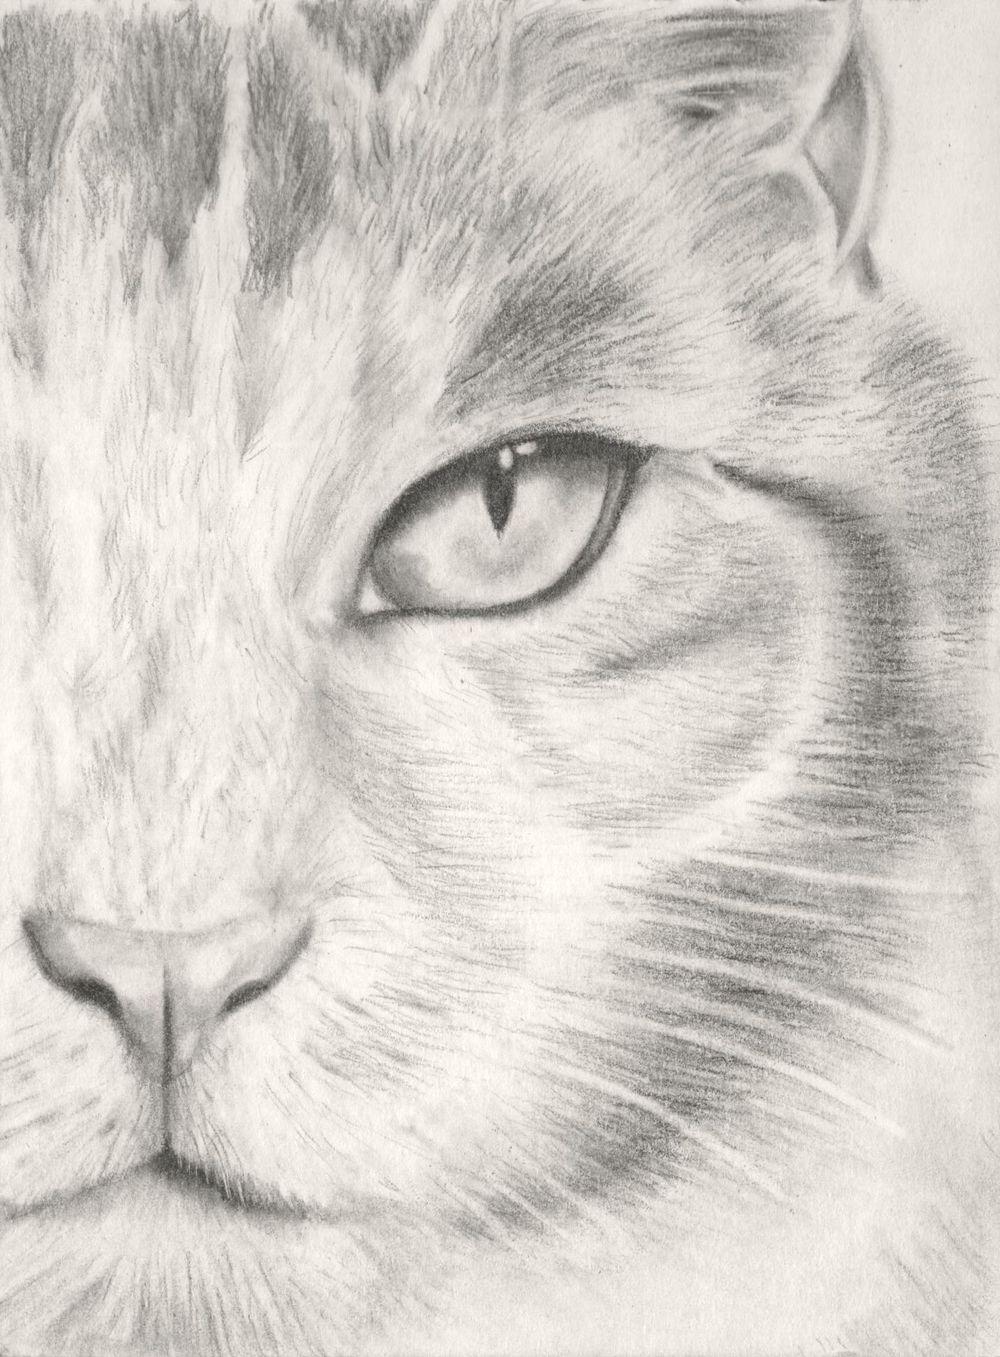 Kitten - image 4 - student project